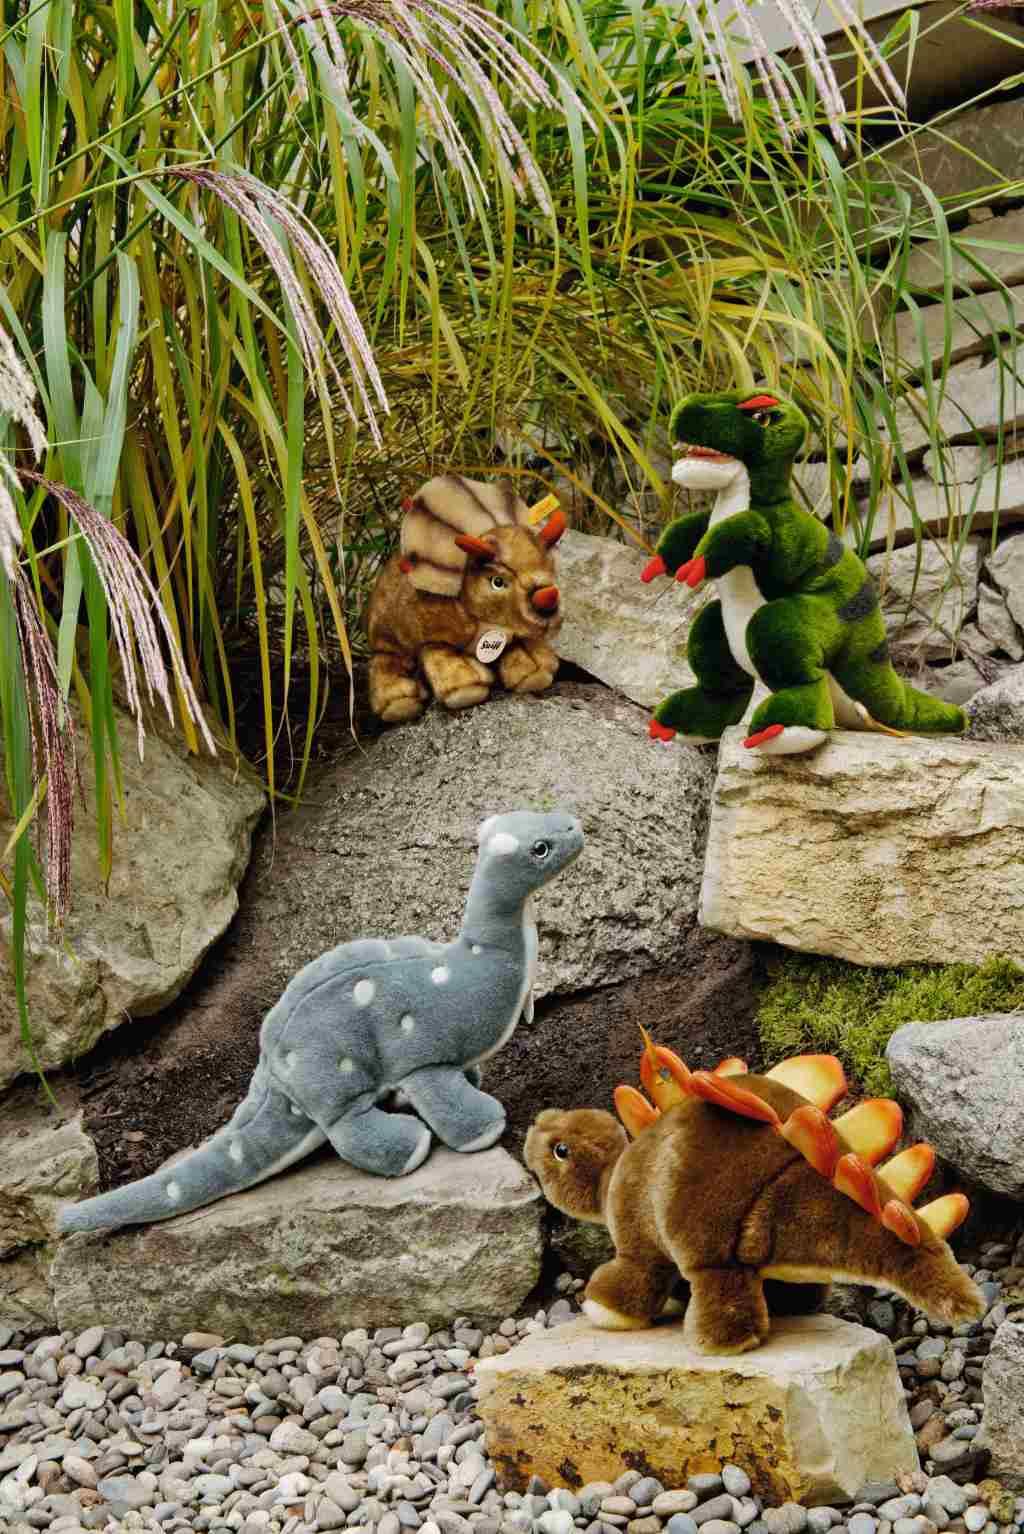 Fantasietiere, Dinosaurier